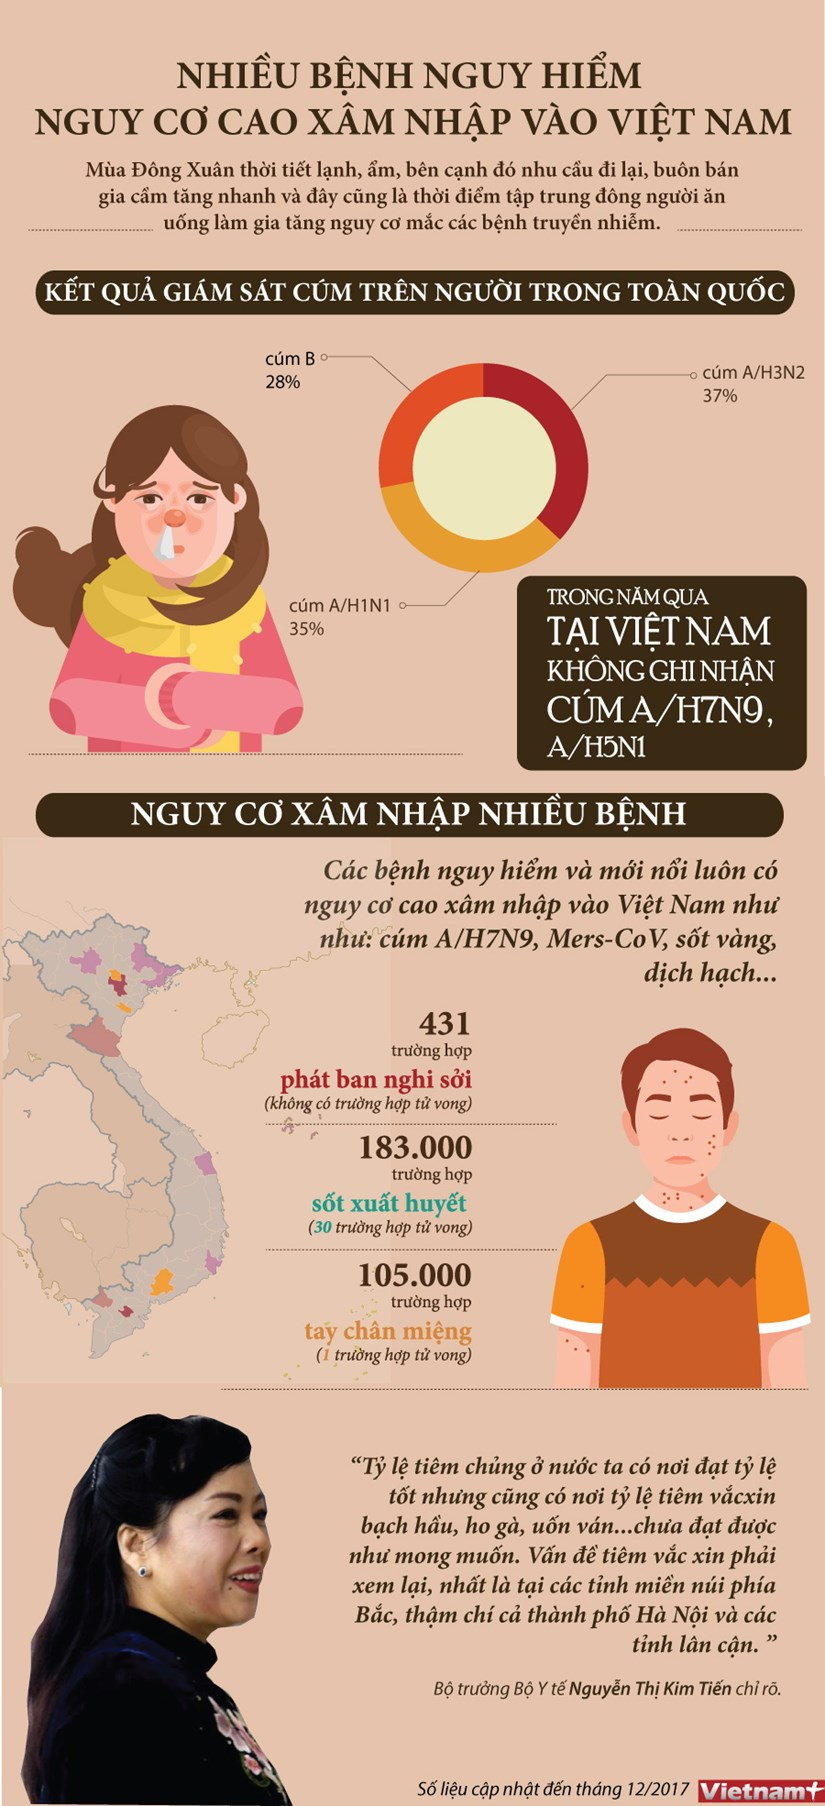 [Infographics] Nhieu benh nguy hiem co nguy co cao xam nhap vao VN hinh anh 1